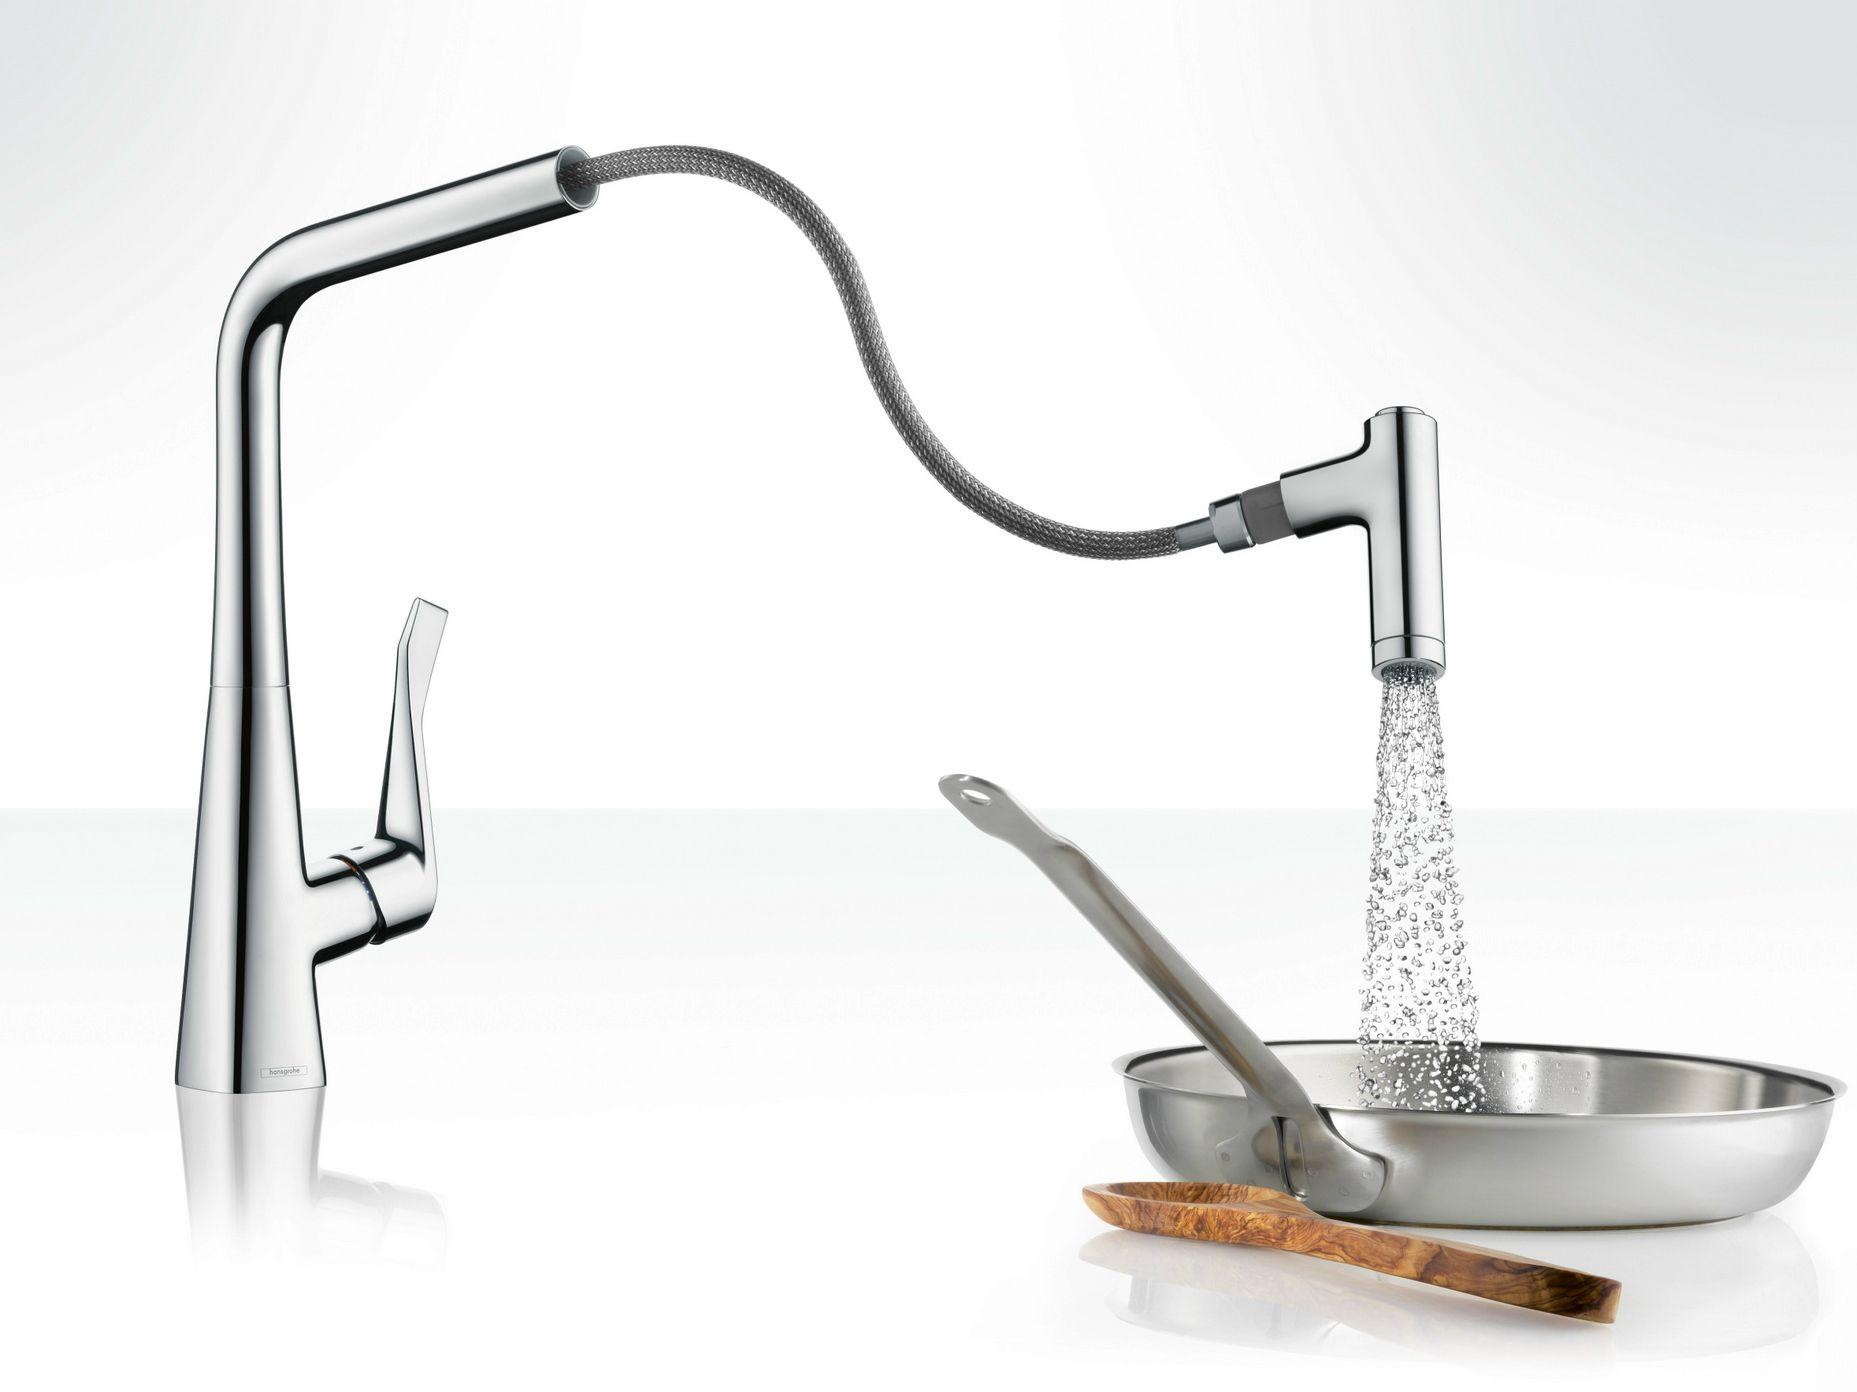 Metris robinet de cuisine chrome by hansgrohe design - Robinet cuisine hansgrohe ...